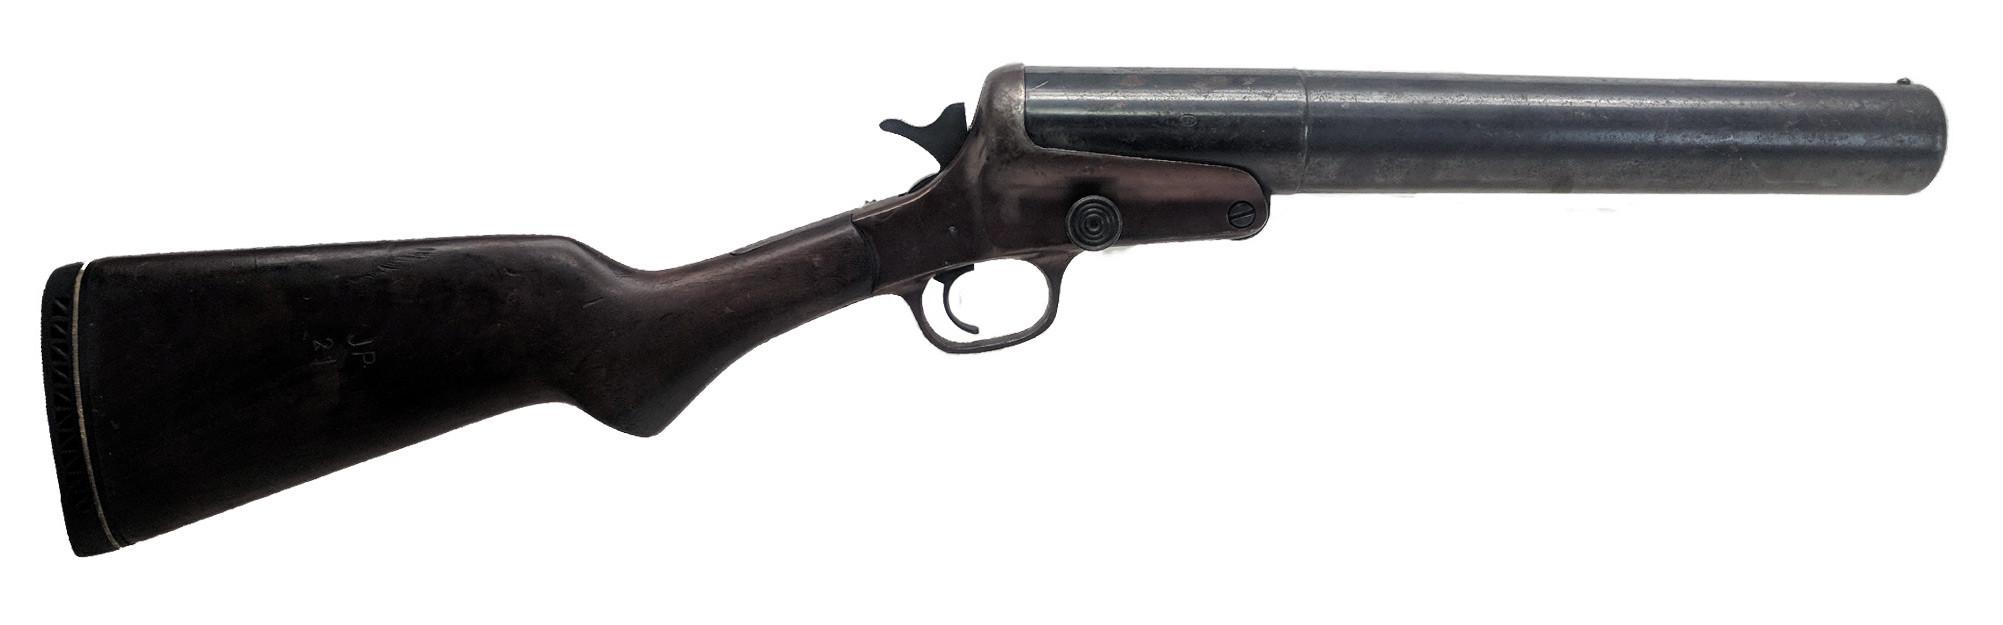 Tru-Flite Super Long Range Gas Gun, 37mm, *Good, Incomplete*